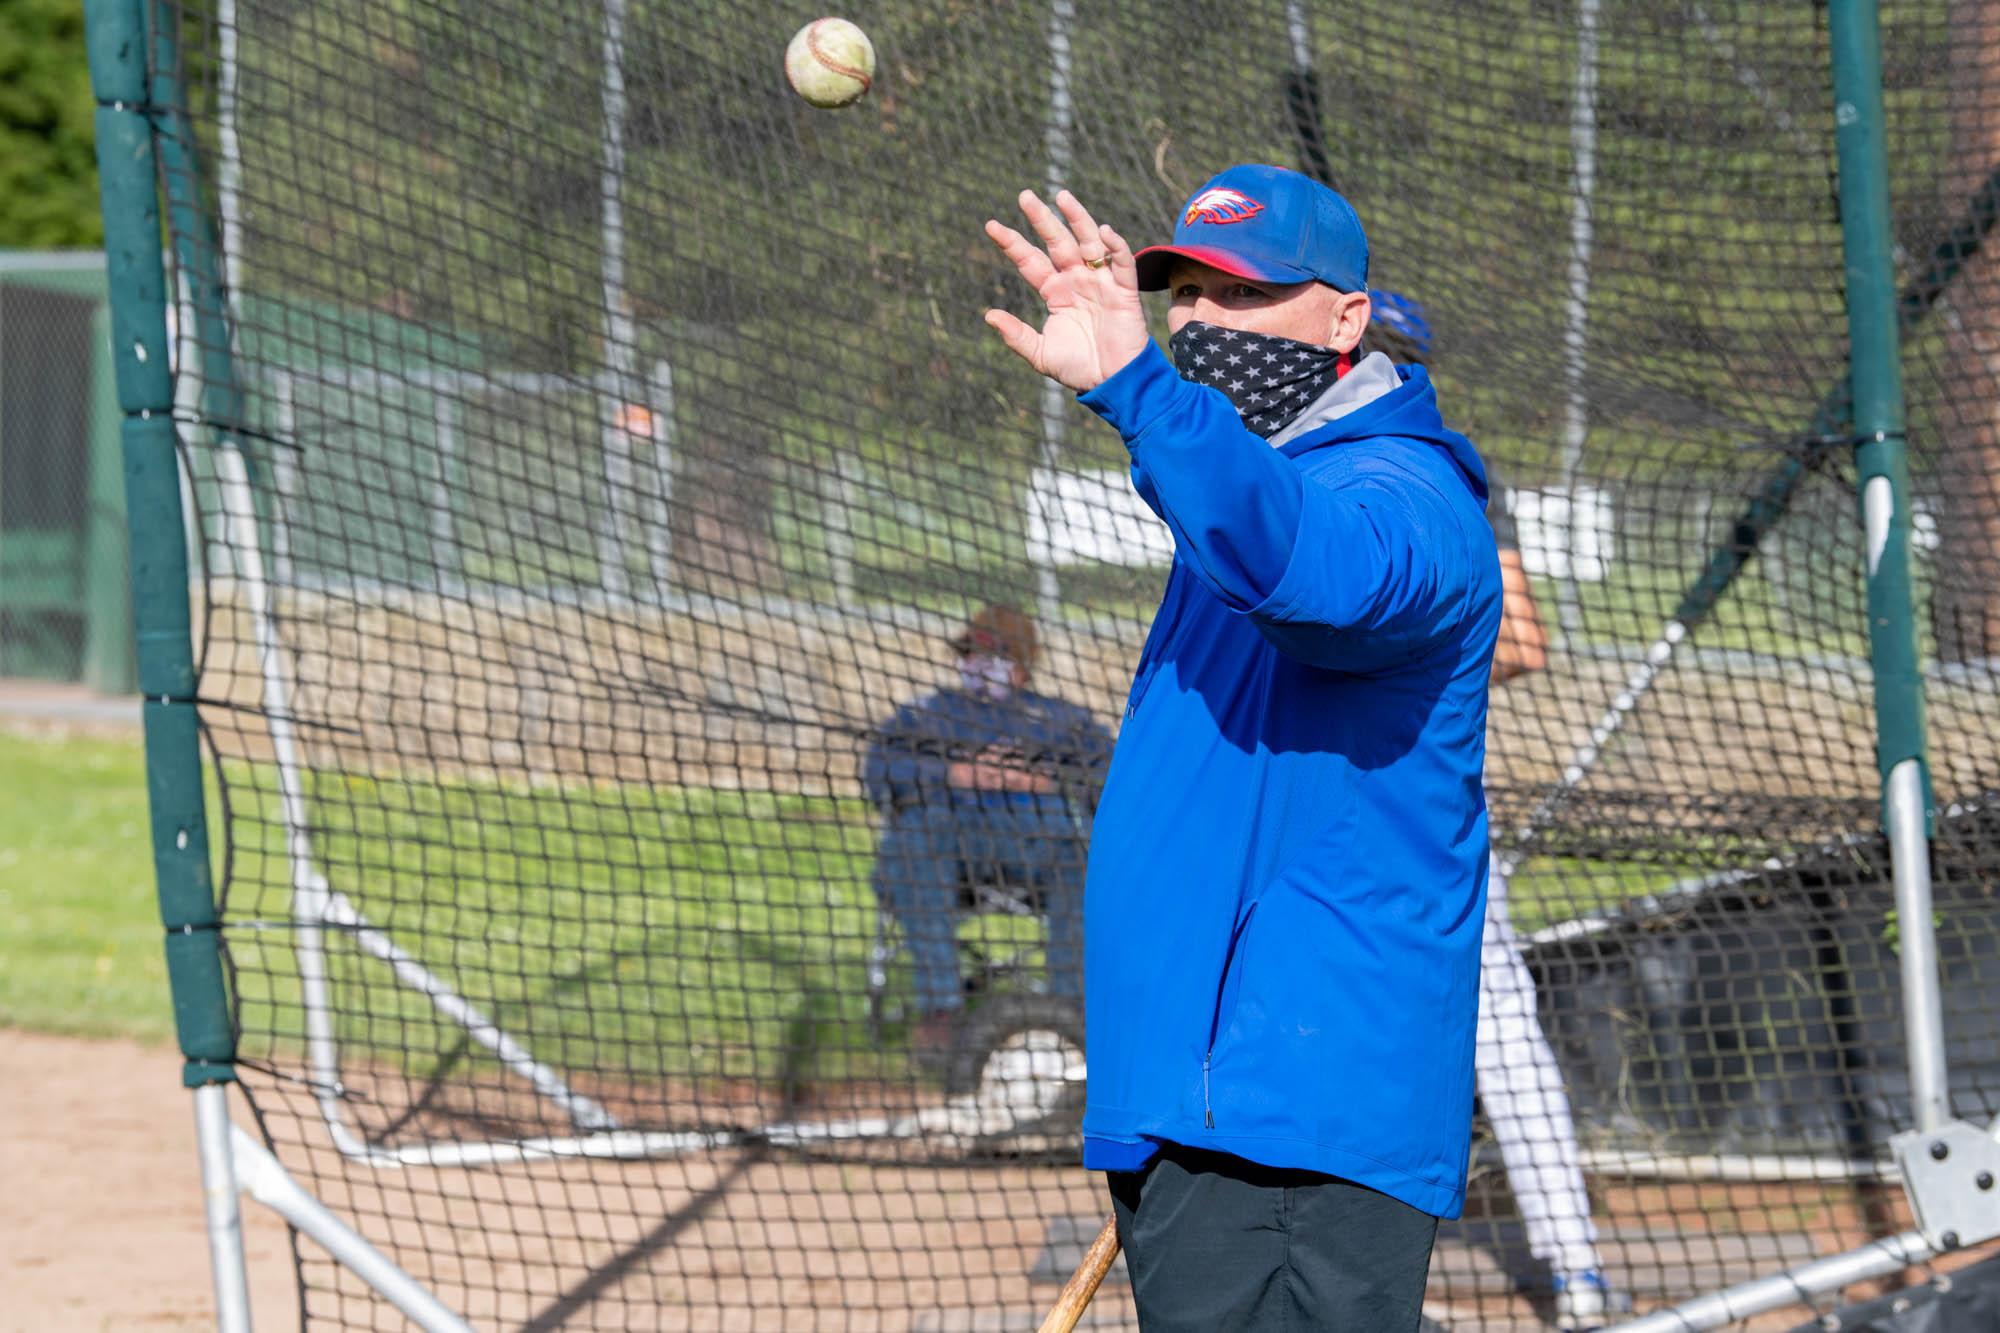 Coach Dan Joyner catches an incoming ball.